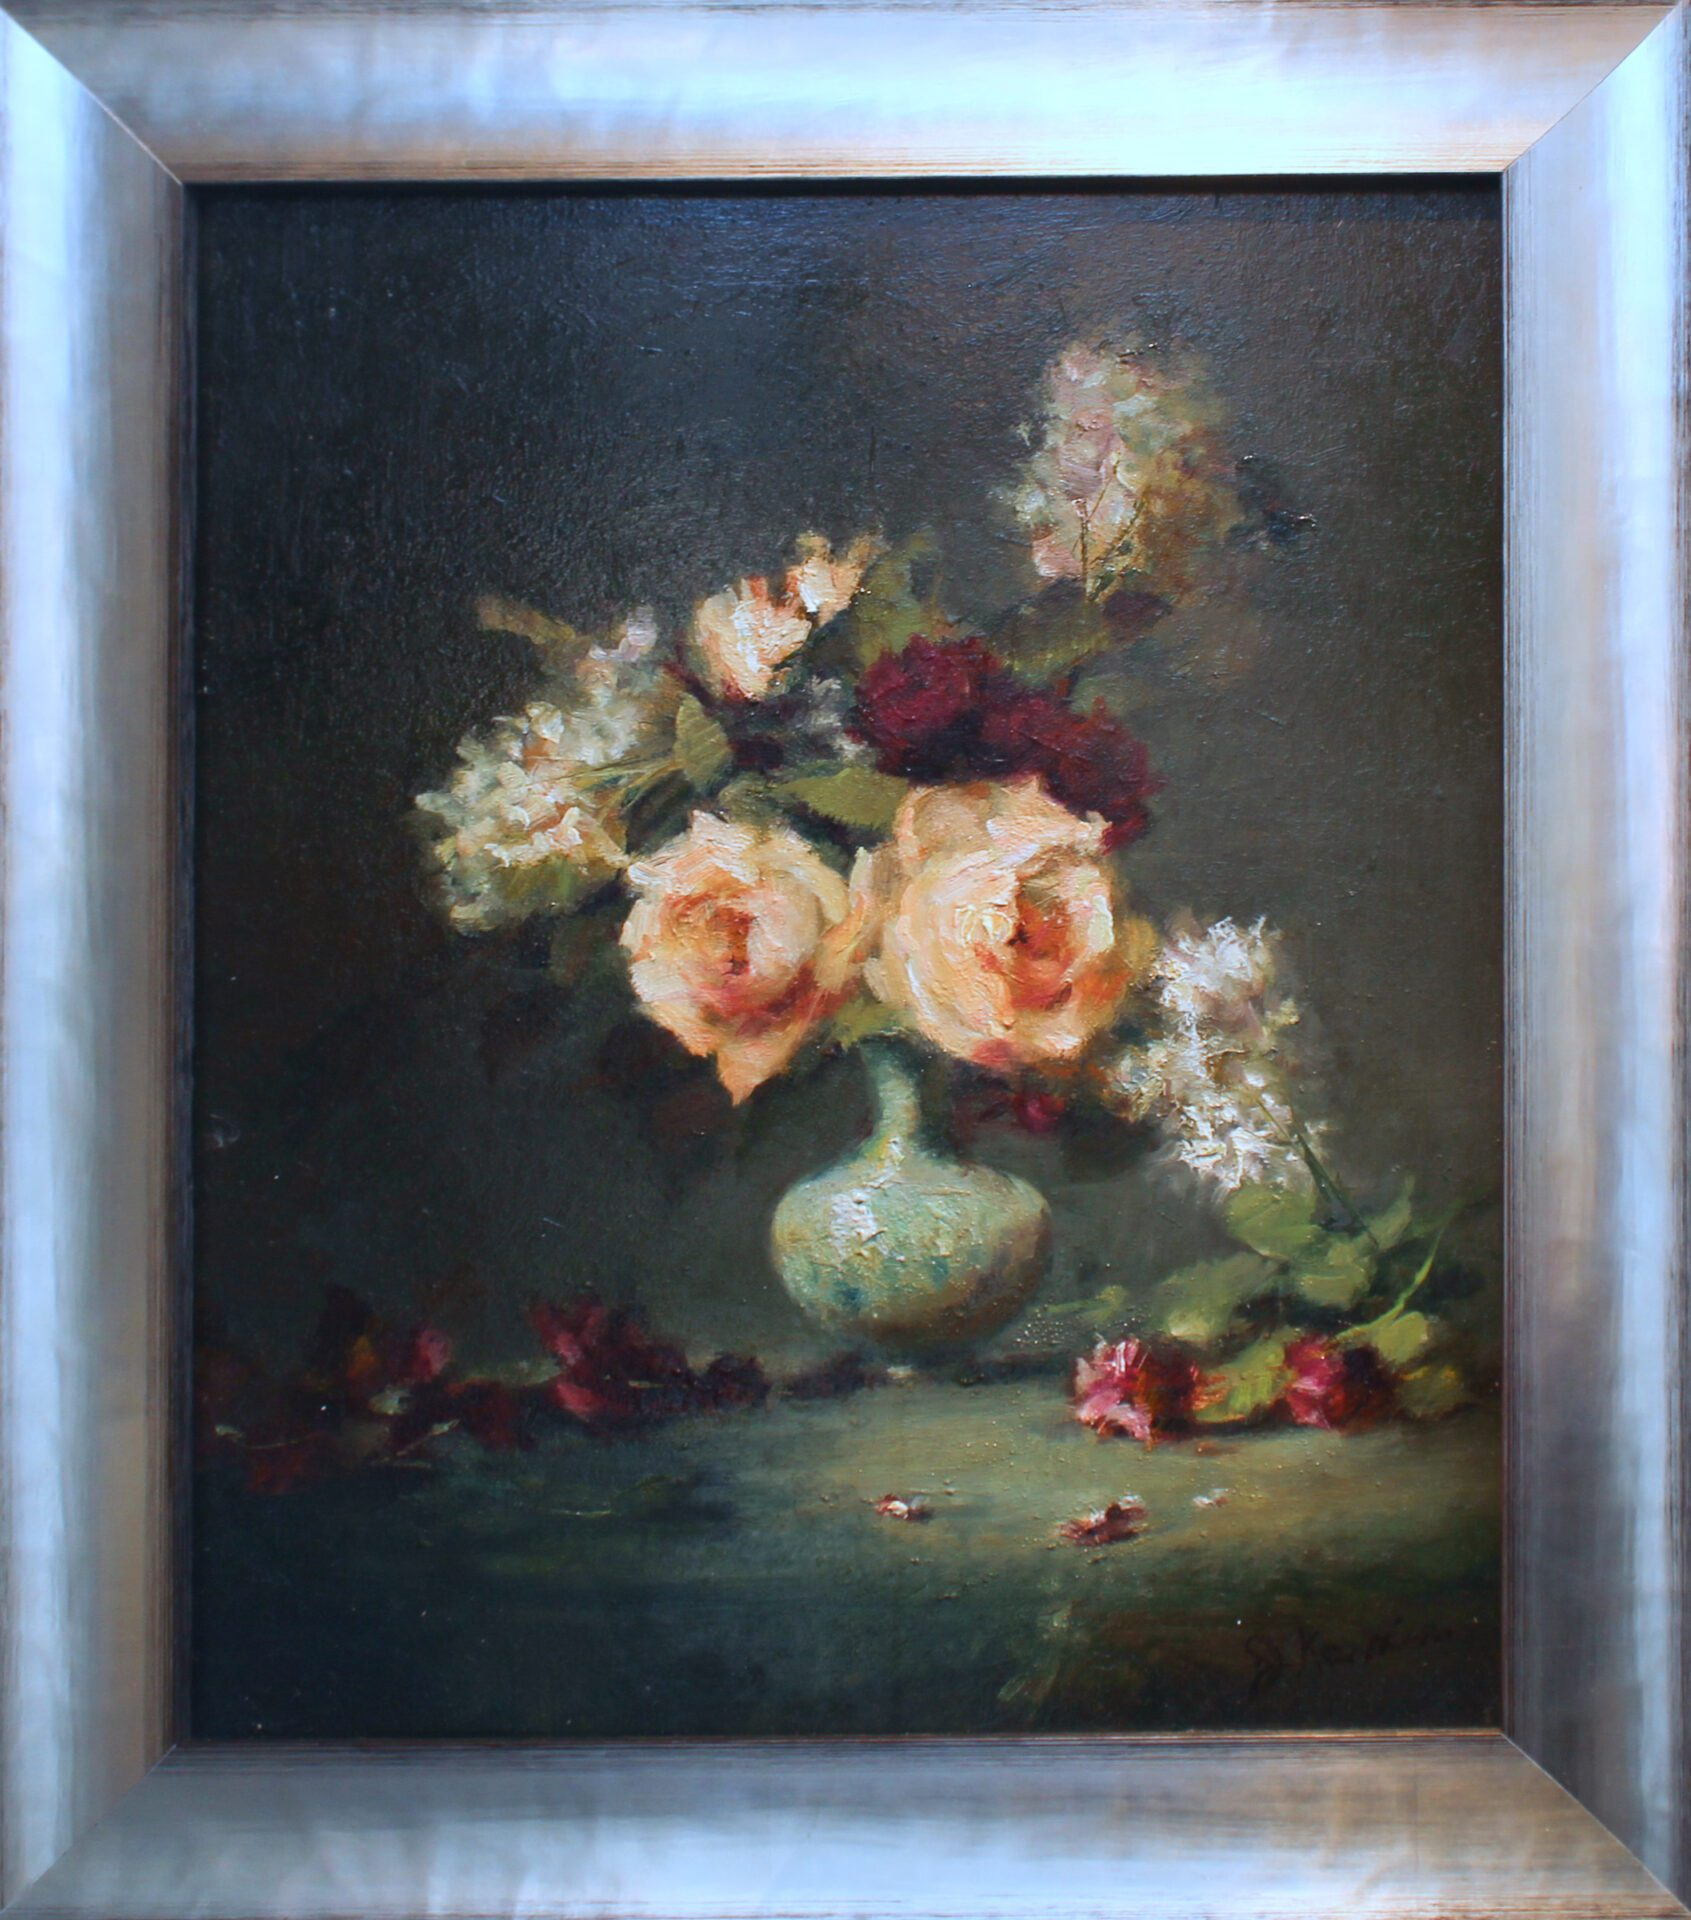 Kamin_Lilacs_and_Roses_16x13_Frame